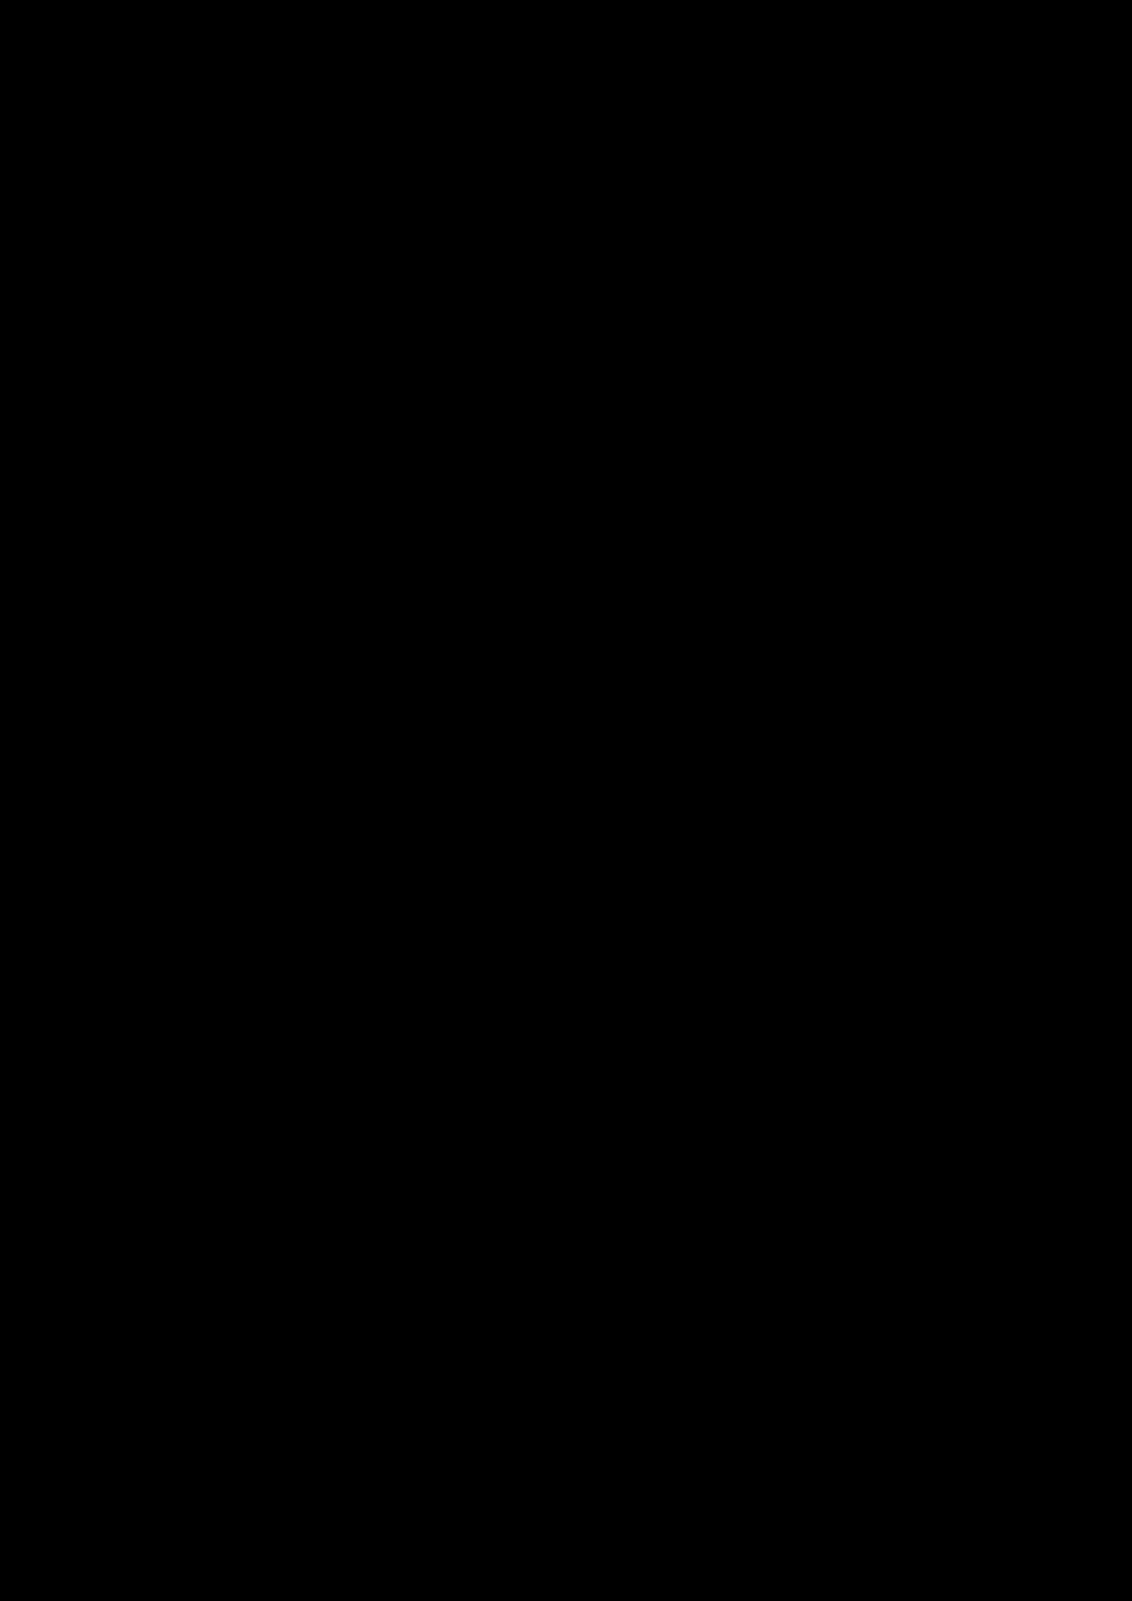 Ten lyubvi slide, Image 40